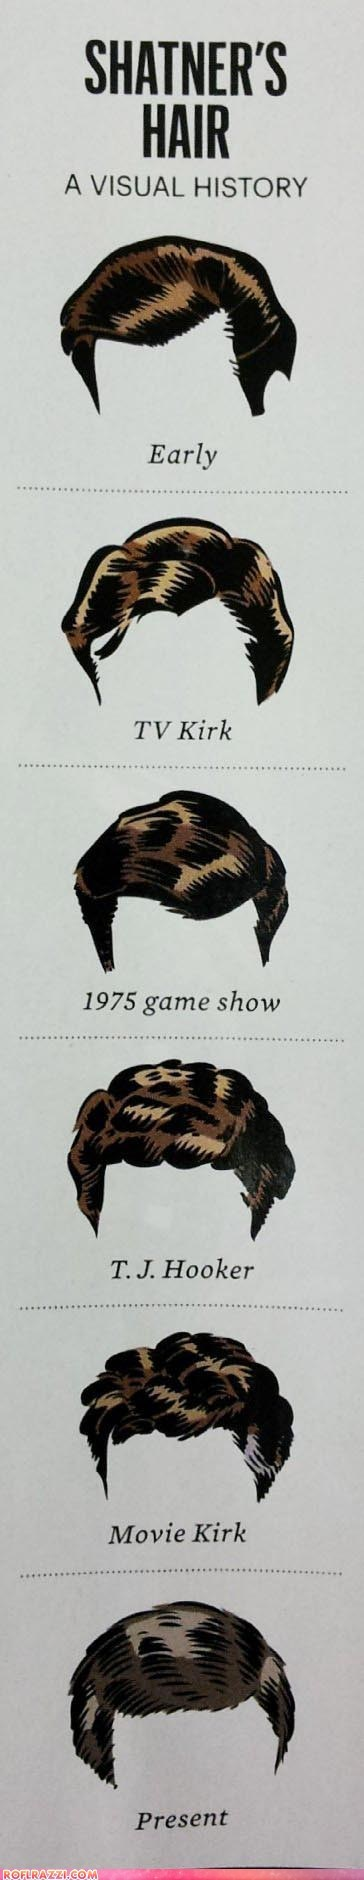 actor art celeb funny infographic William Shatner - 6332896512